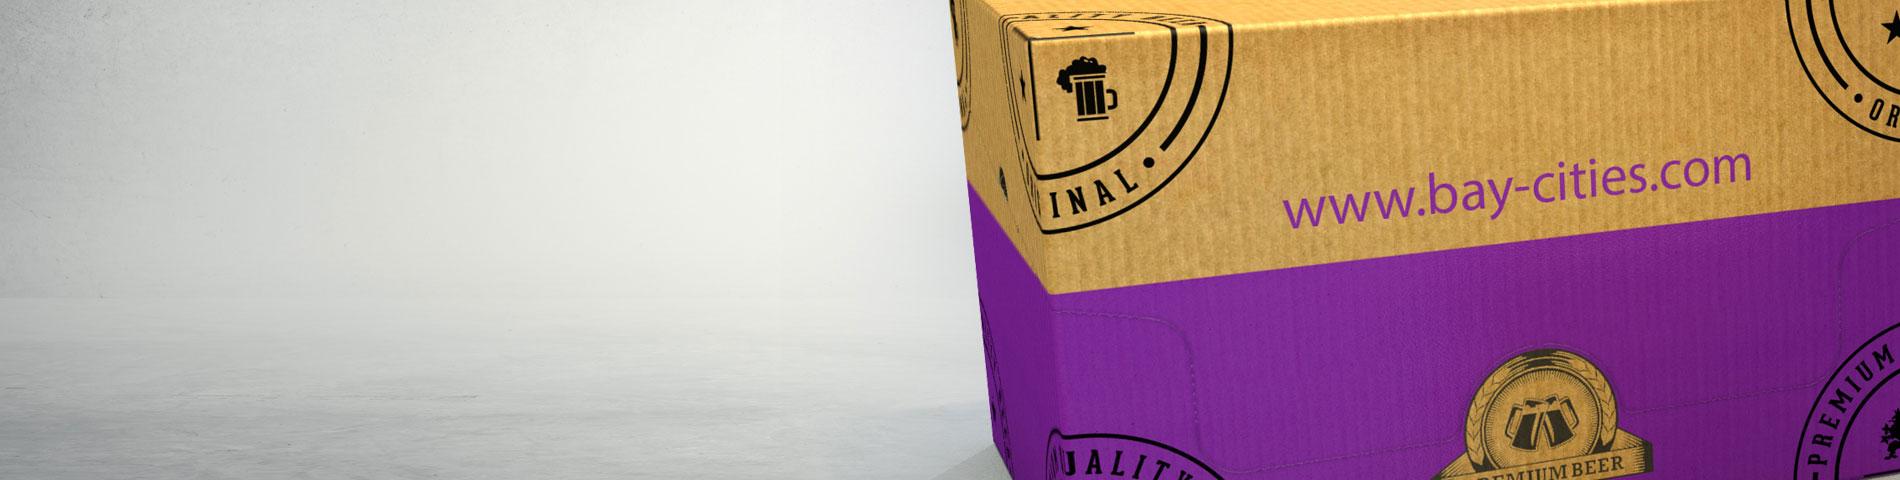 Retail Ready Adult Beverage Cardboard Box